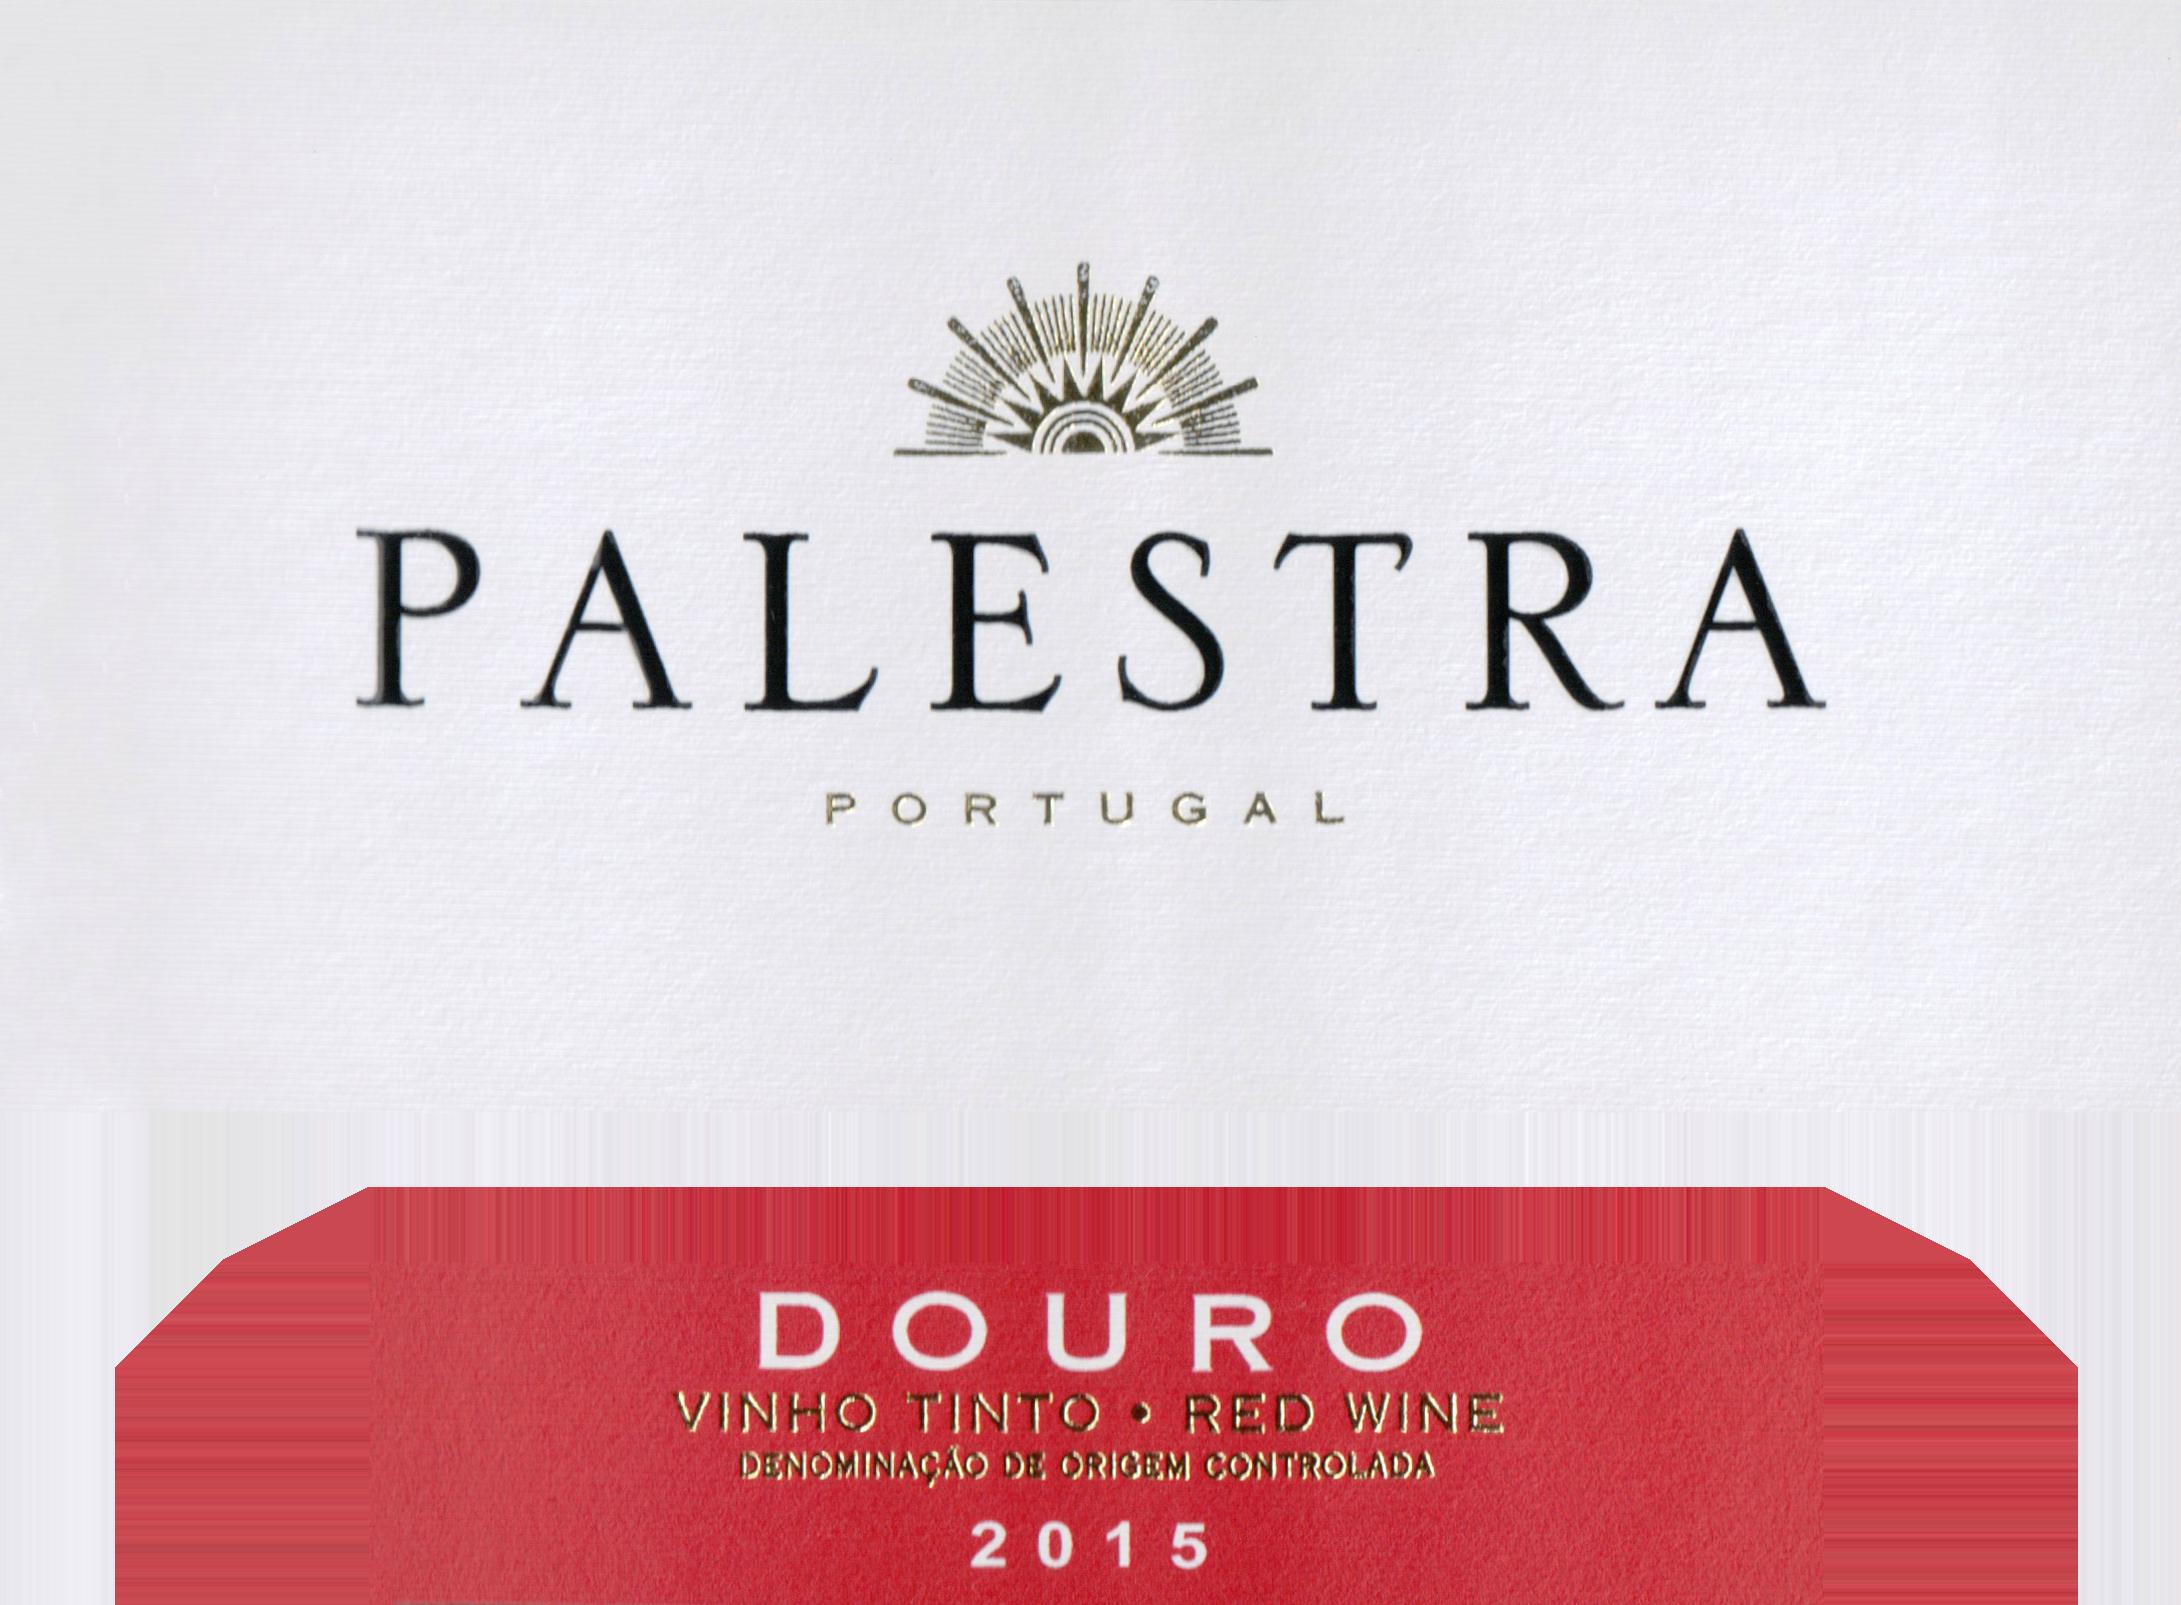 Palestra Douro 2015